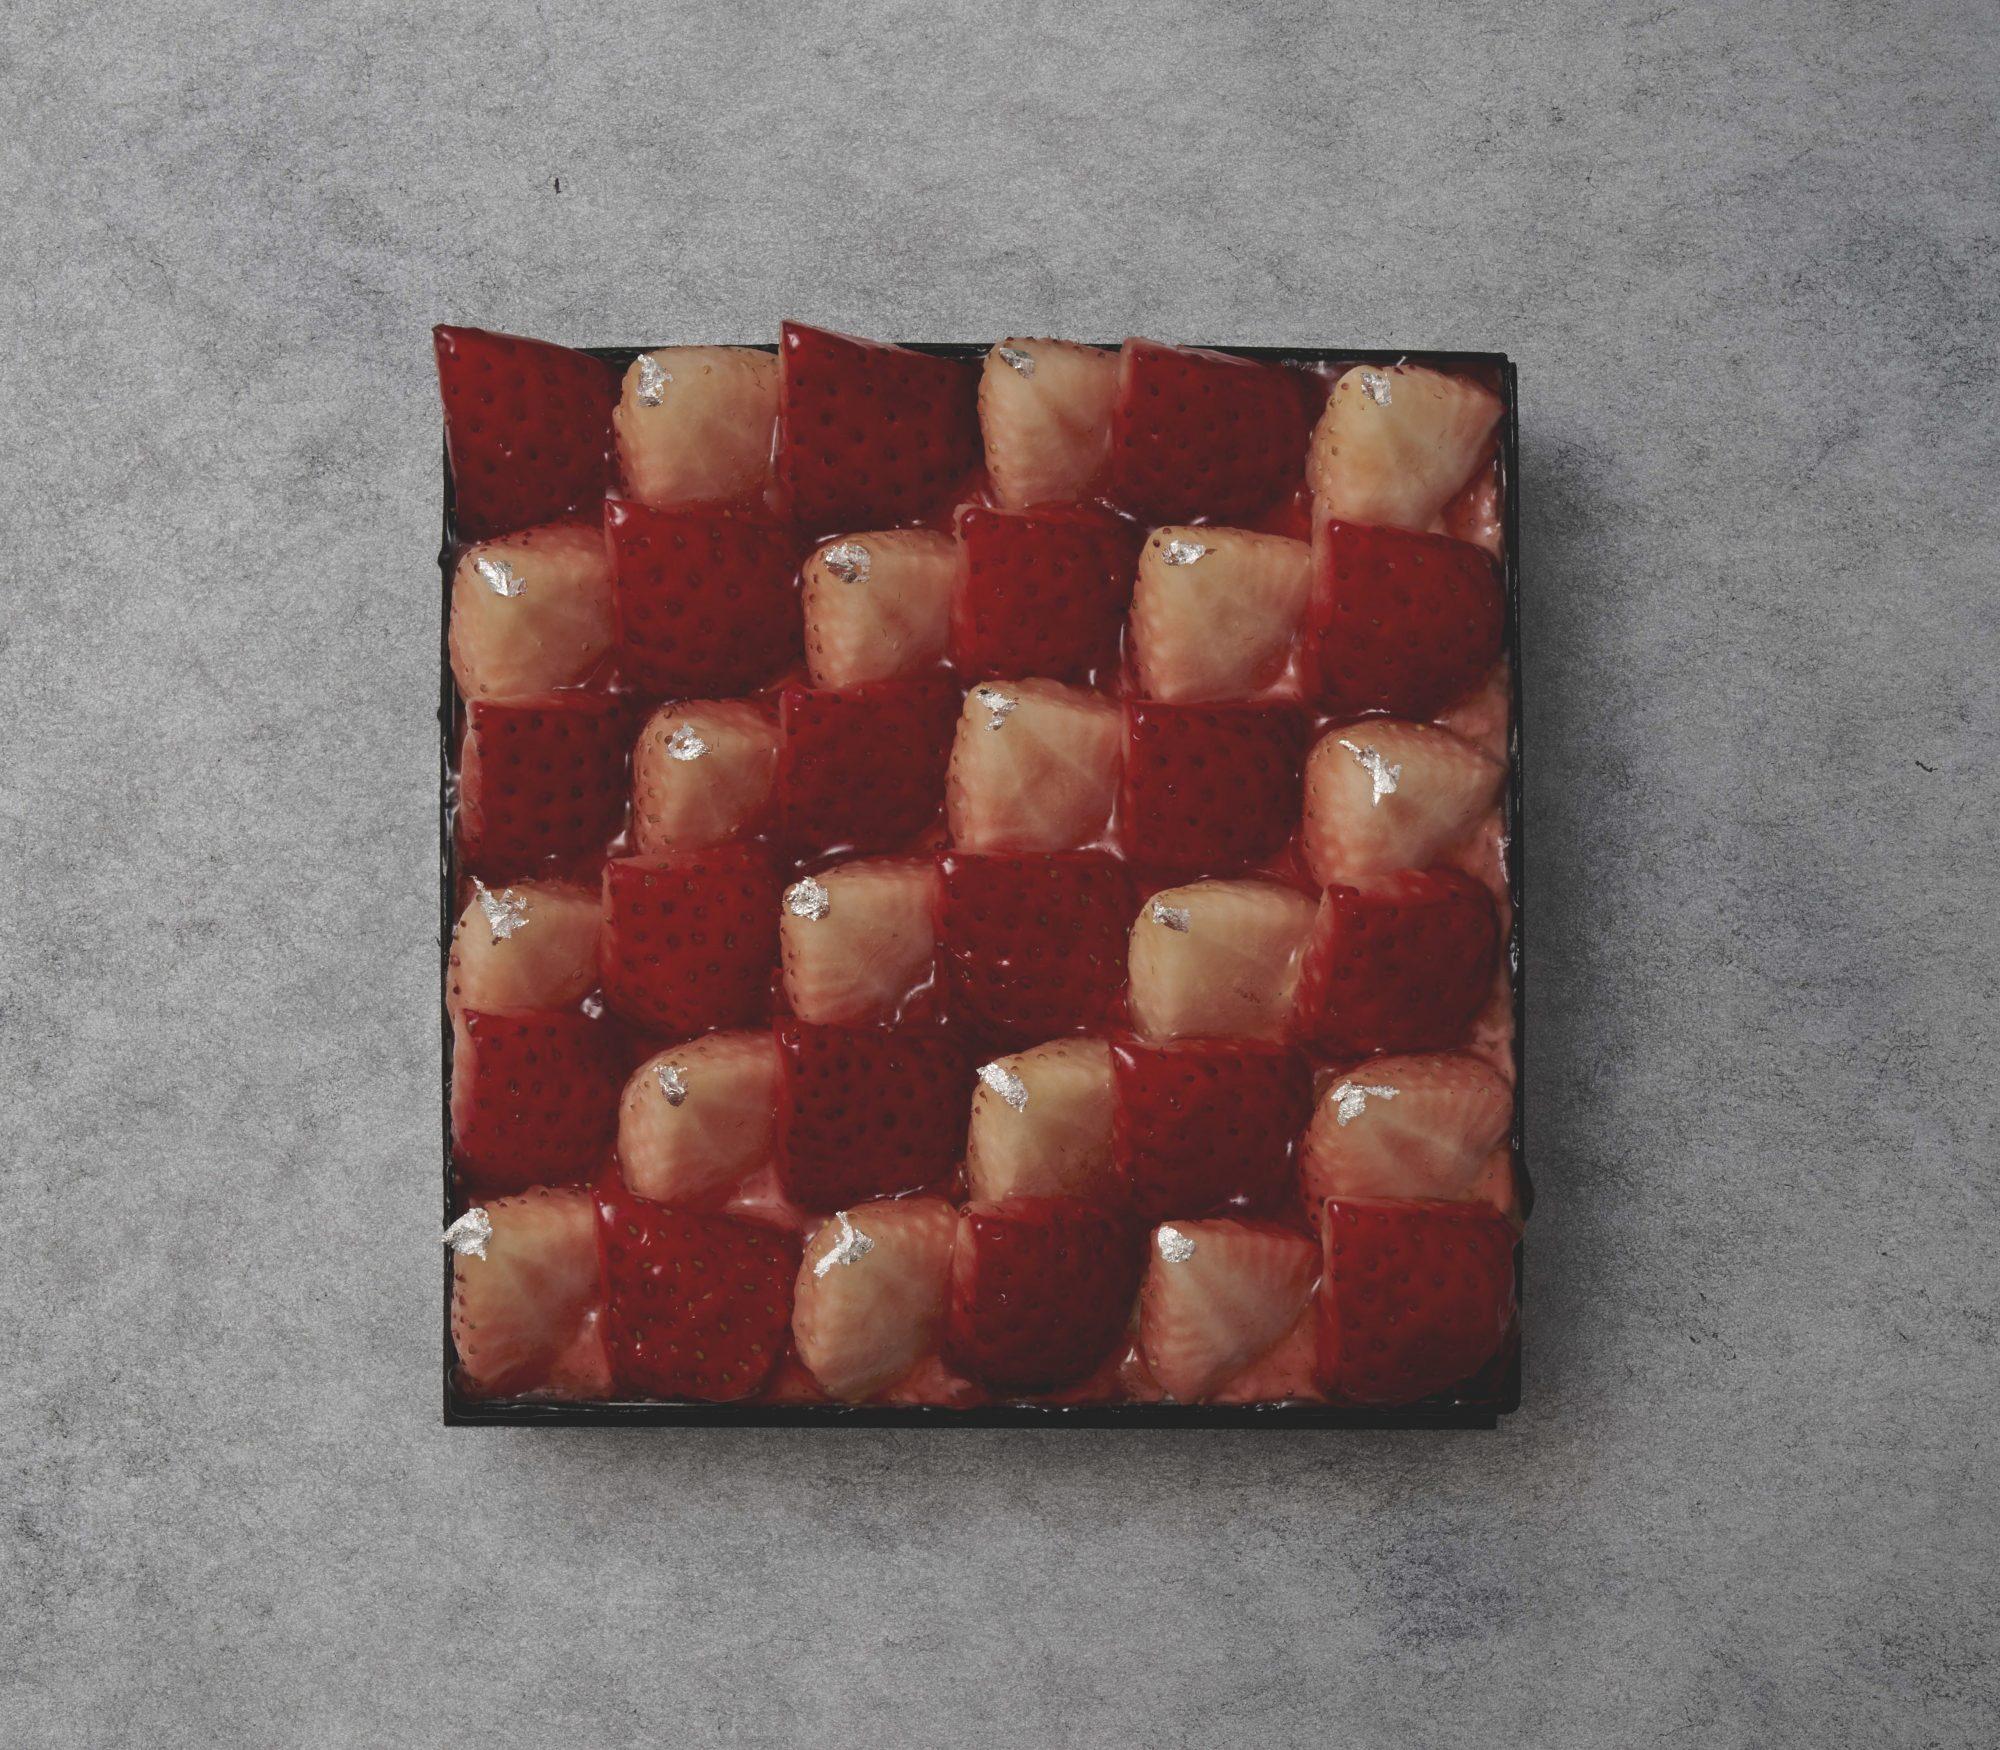 StrawberriesTop